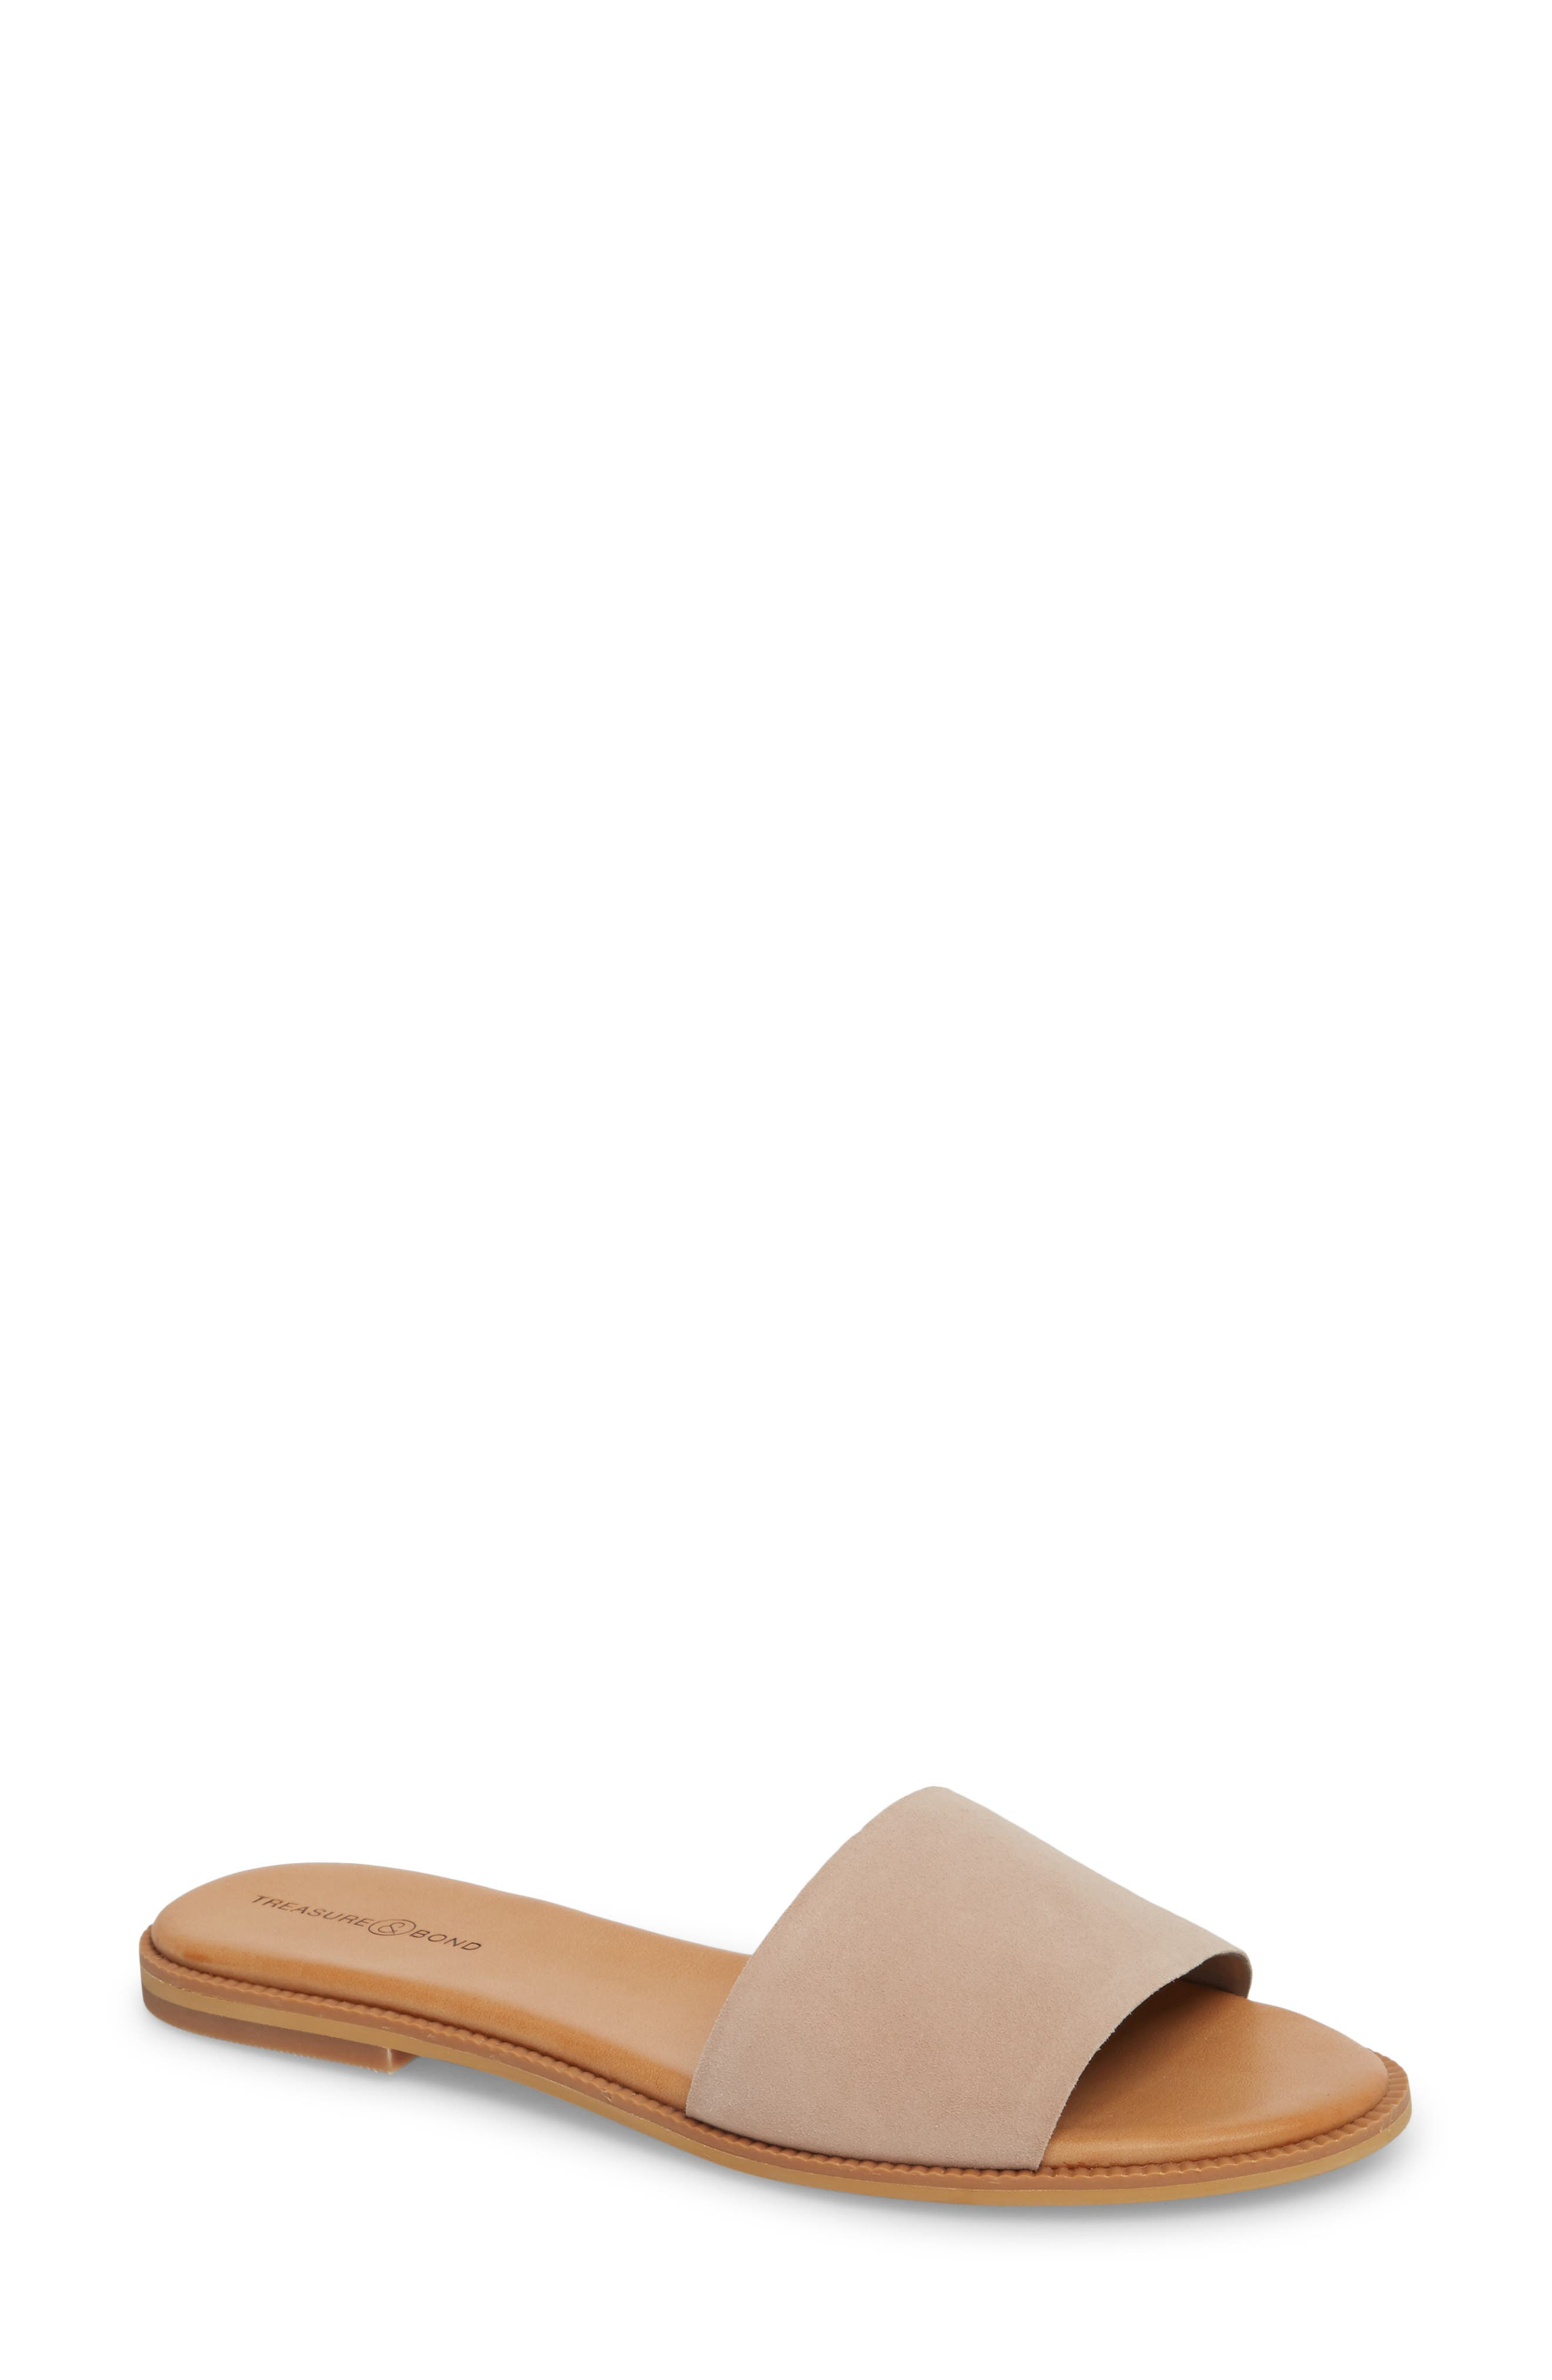 TREASURE & BOND, Mere Flat Slide Sandal, Main thumbnail 1, color, NEW BLUSH SUEDE